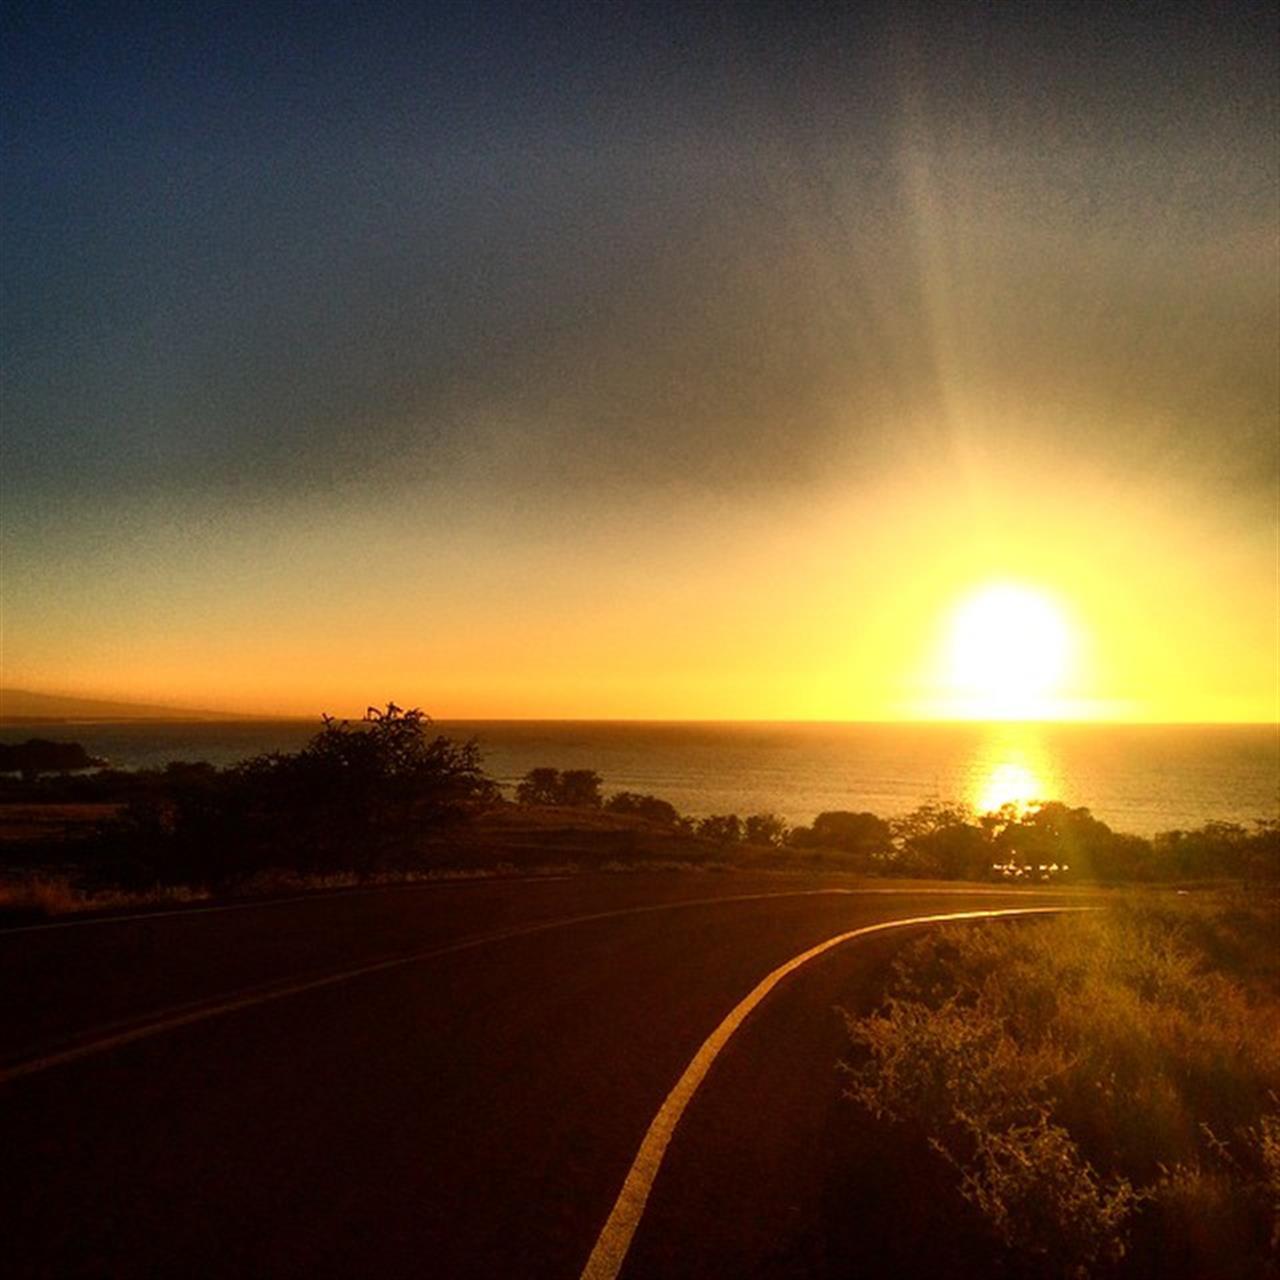 Keep looking up! I learn from the past, dream about the future and always look up. There's nothing like a beautiful sunset to end a healthy day in Hawaii Nei!! #beSunny #HawaiiLife #HawaiiNewsNow #hawaiistagram #glimpseofhawaii #beingbrooke #instahub #wearehawaii #bigsland #kohalacoast #sunsetaday #365hawaiisunset #365sunset #010615